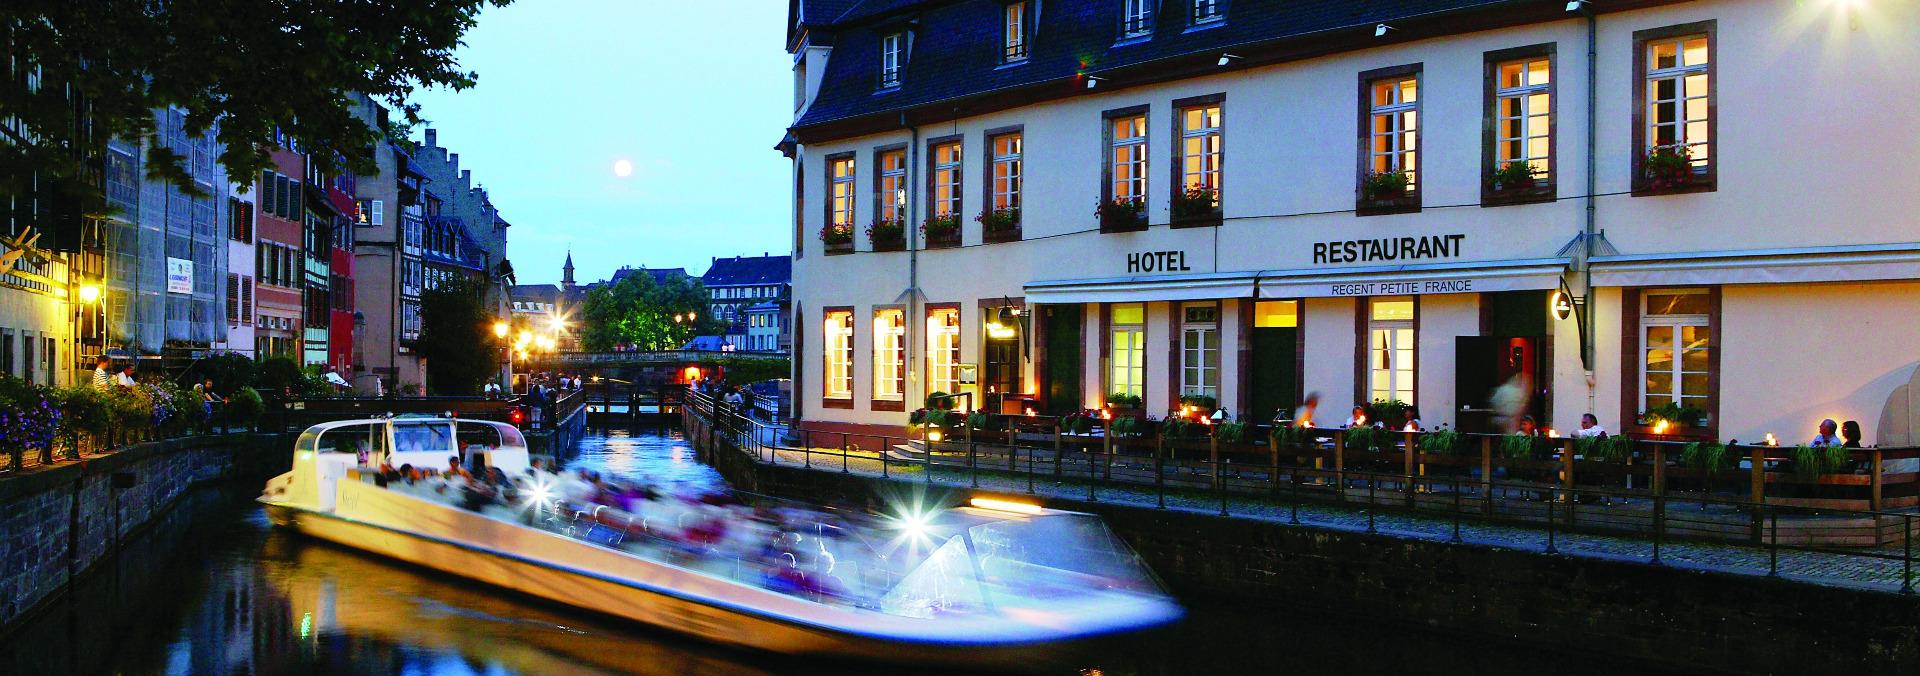 Hôtel régent petite france  spa à Strasbourg